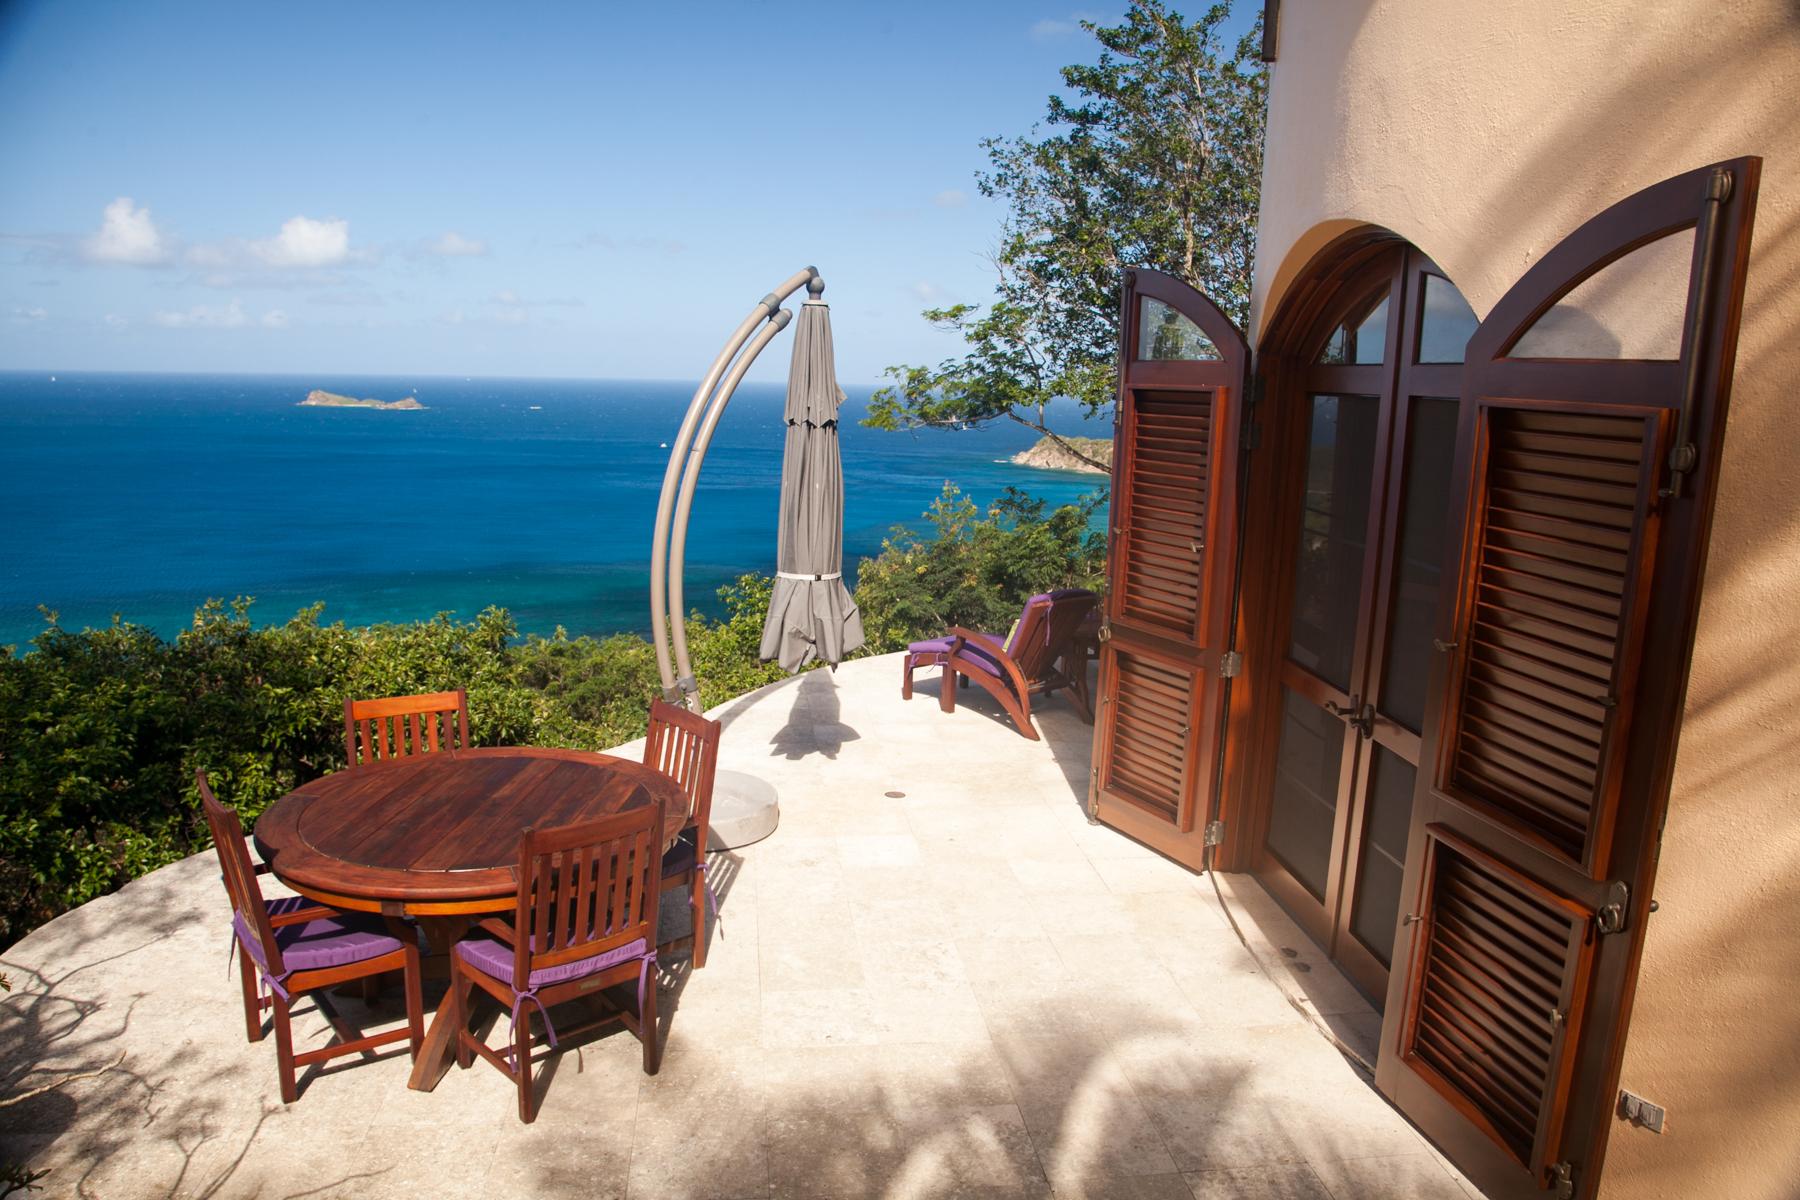 Single Family Home for Sale at Lan Y Mor Nail Bay, Virgin Gorda British Virgin Islands